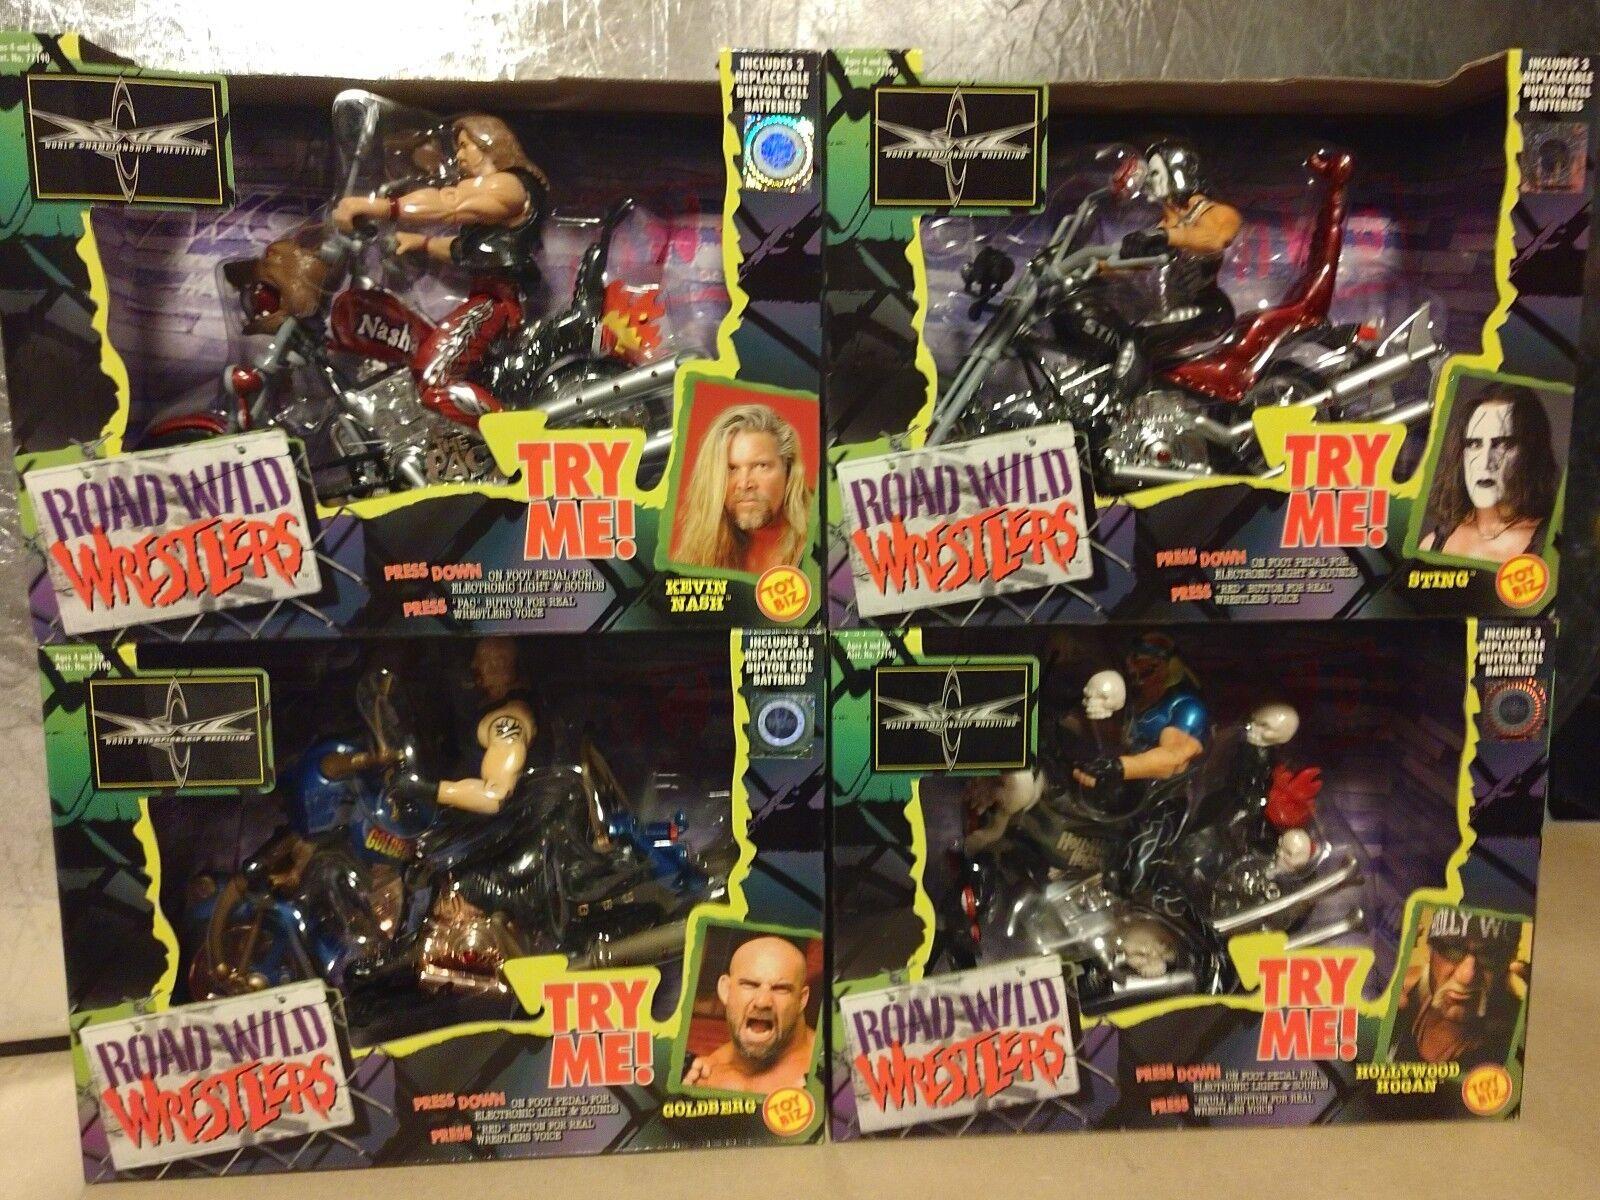 1999 WCW Road Wild Wrestlers Motorcycle Sting, Hulk Hogan, Kevin Nash, goldberg